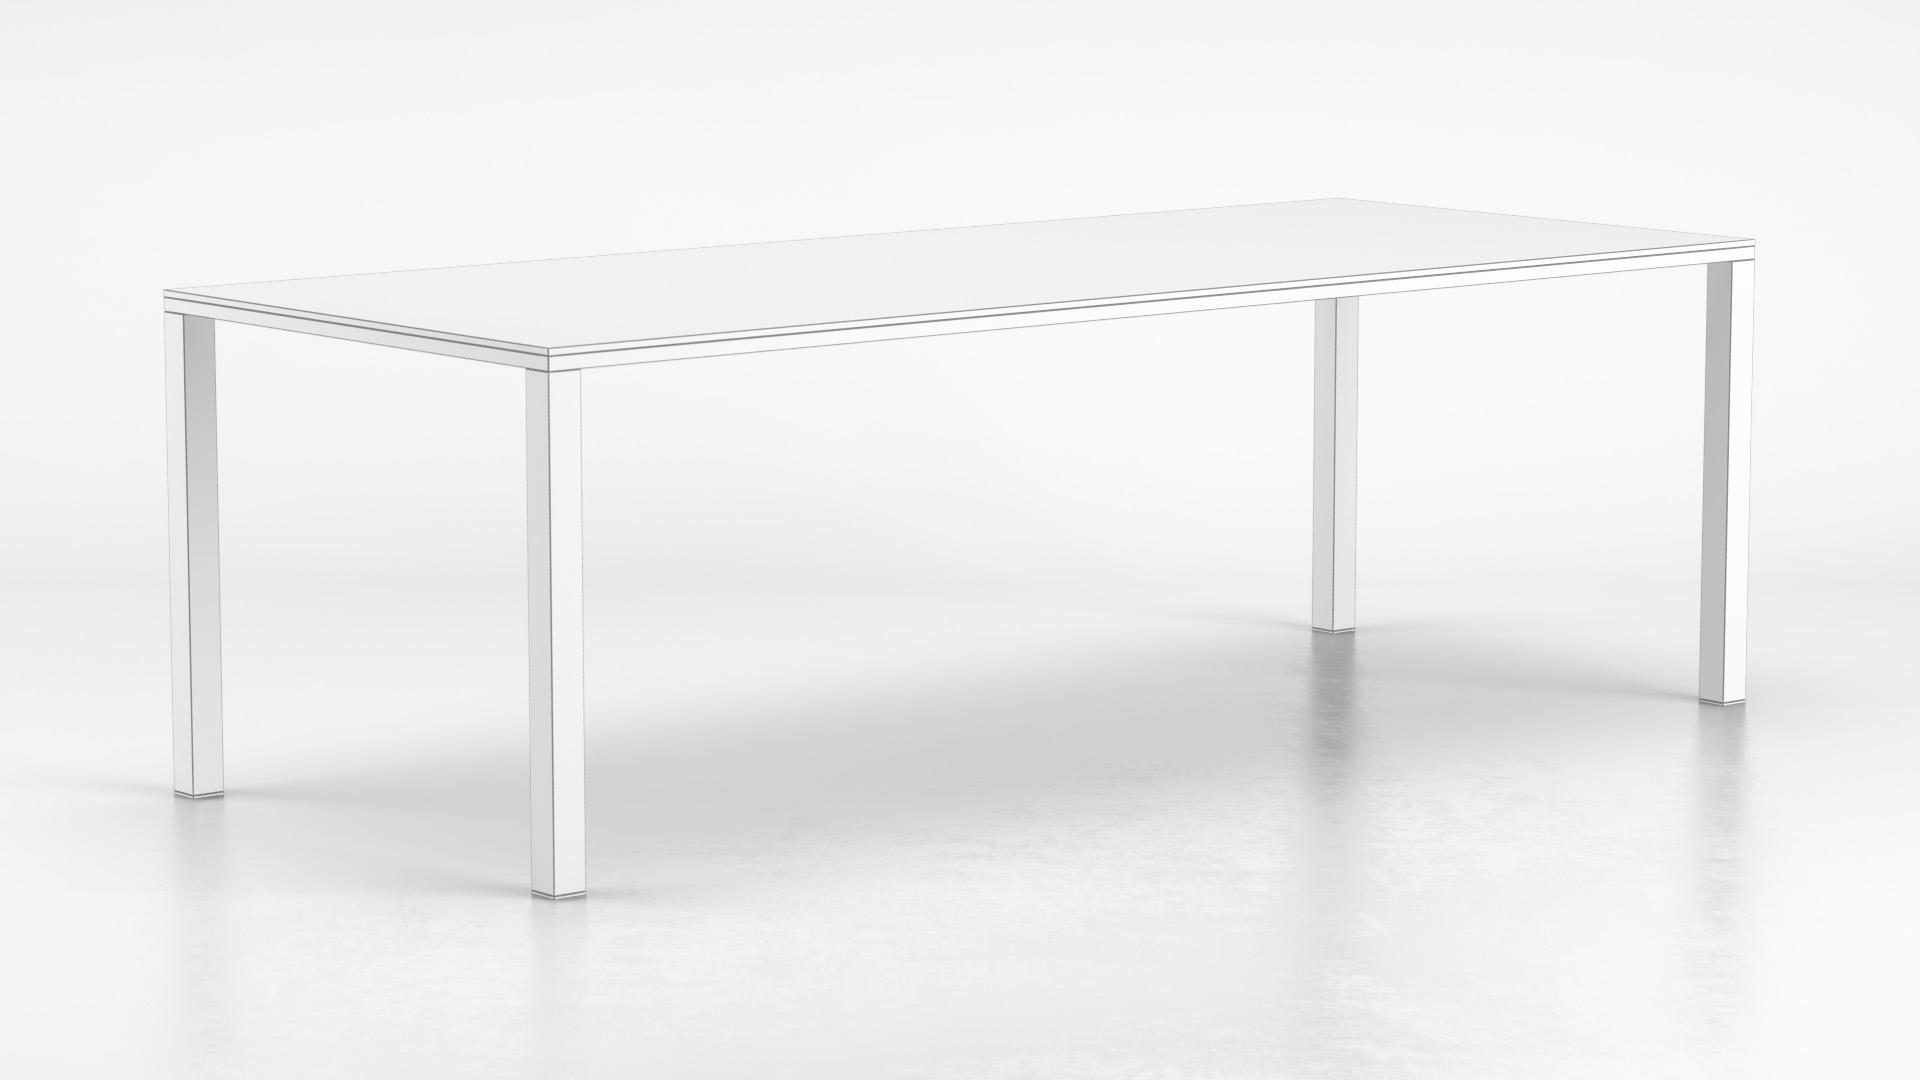 Tribu_Essentiel_Table_WhiteSet_01_wire_0000